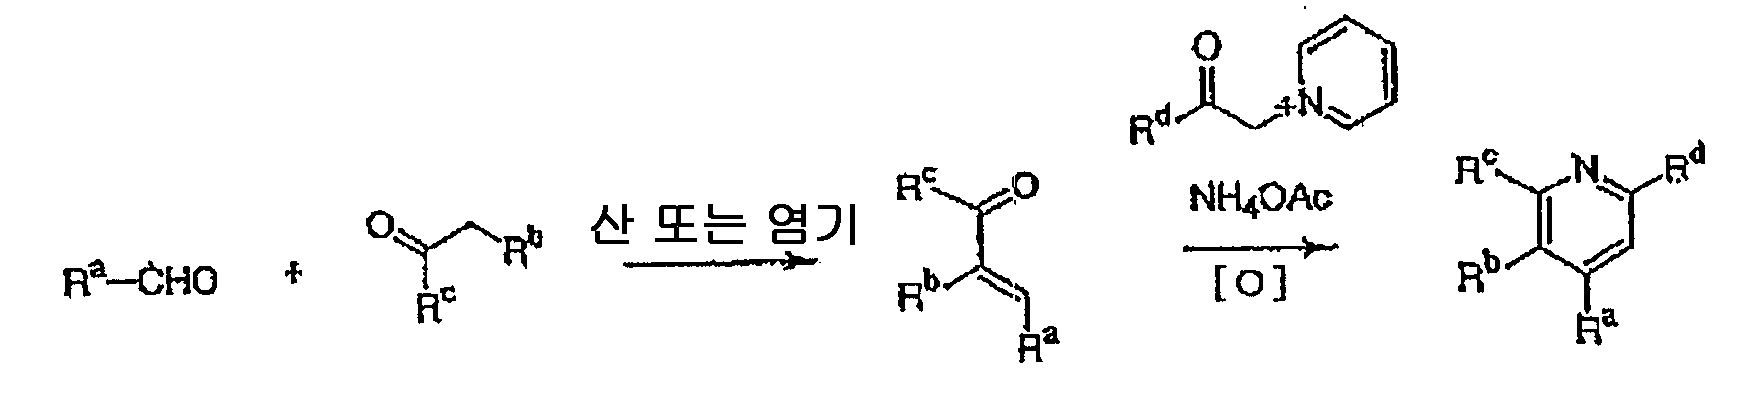 Figure 112010002231902-pat00046